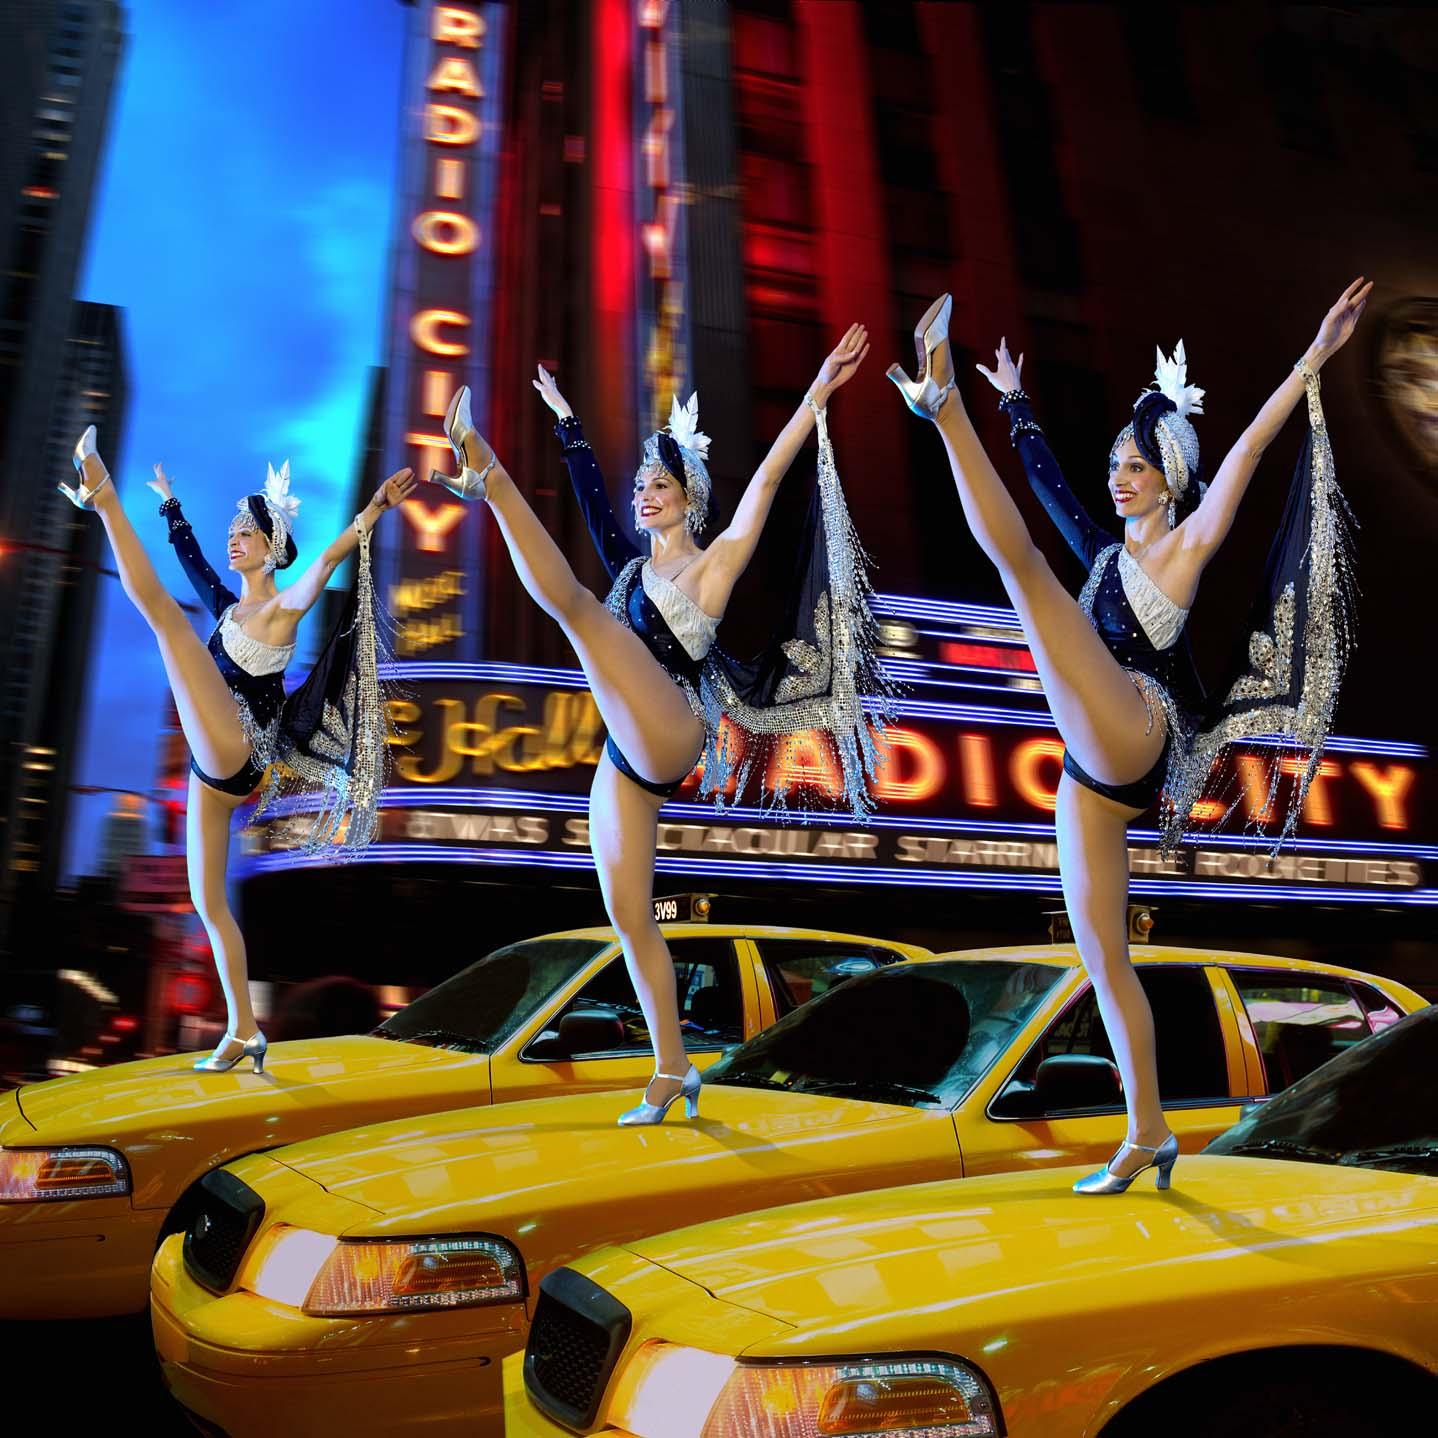 Rox Cab Black